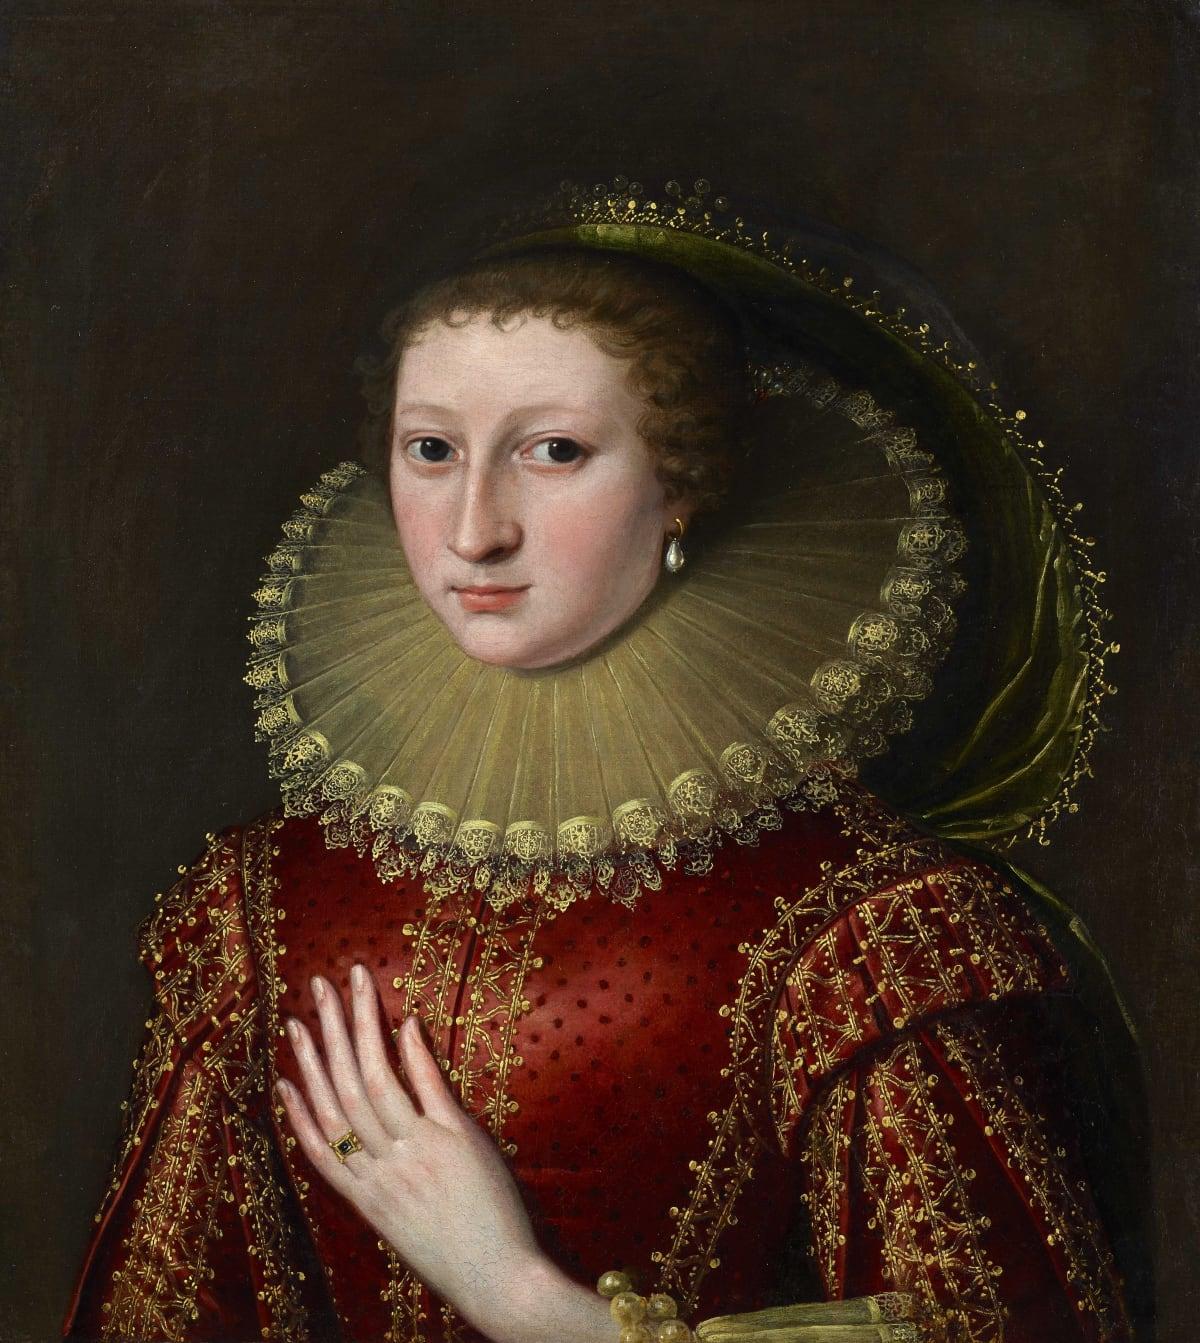 Paul van Somer (c.1577 – 1621) An Unknown Noblewoman, circa 1620 Oil on canvas 23 ½ x 21 ¼ in. (59.7 x 54 cm.)